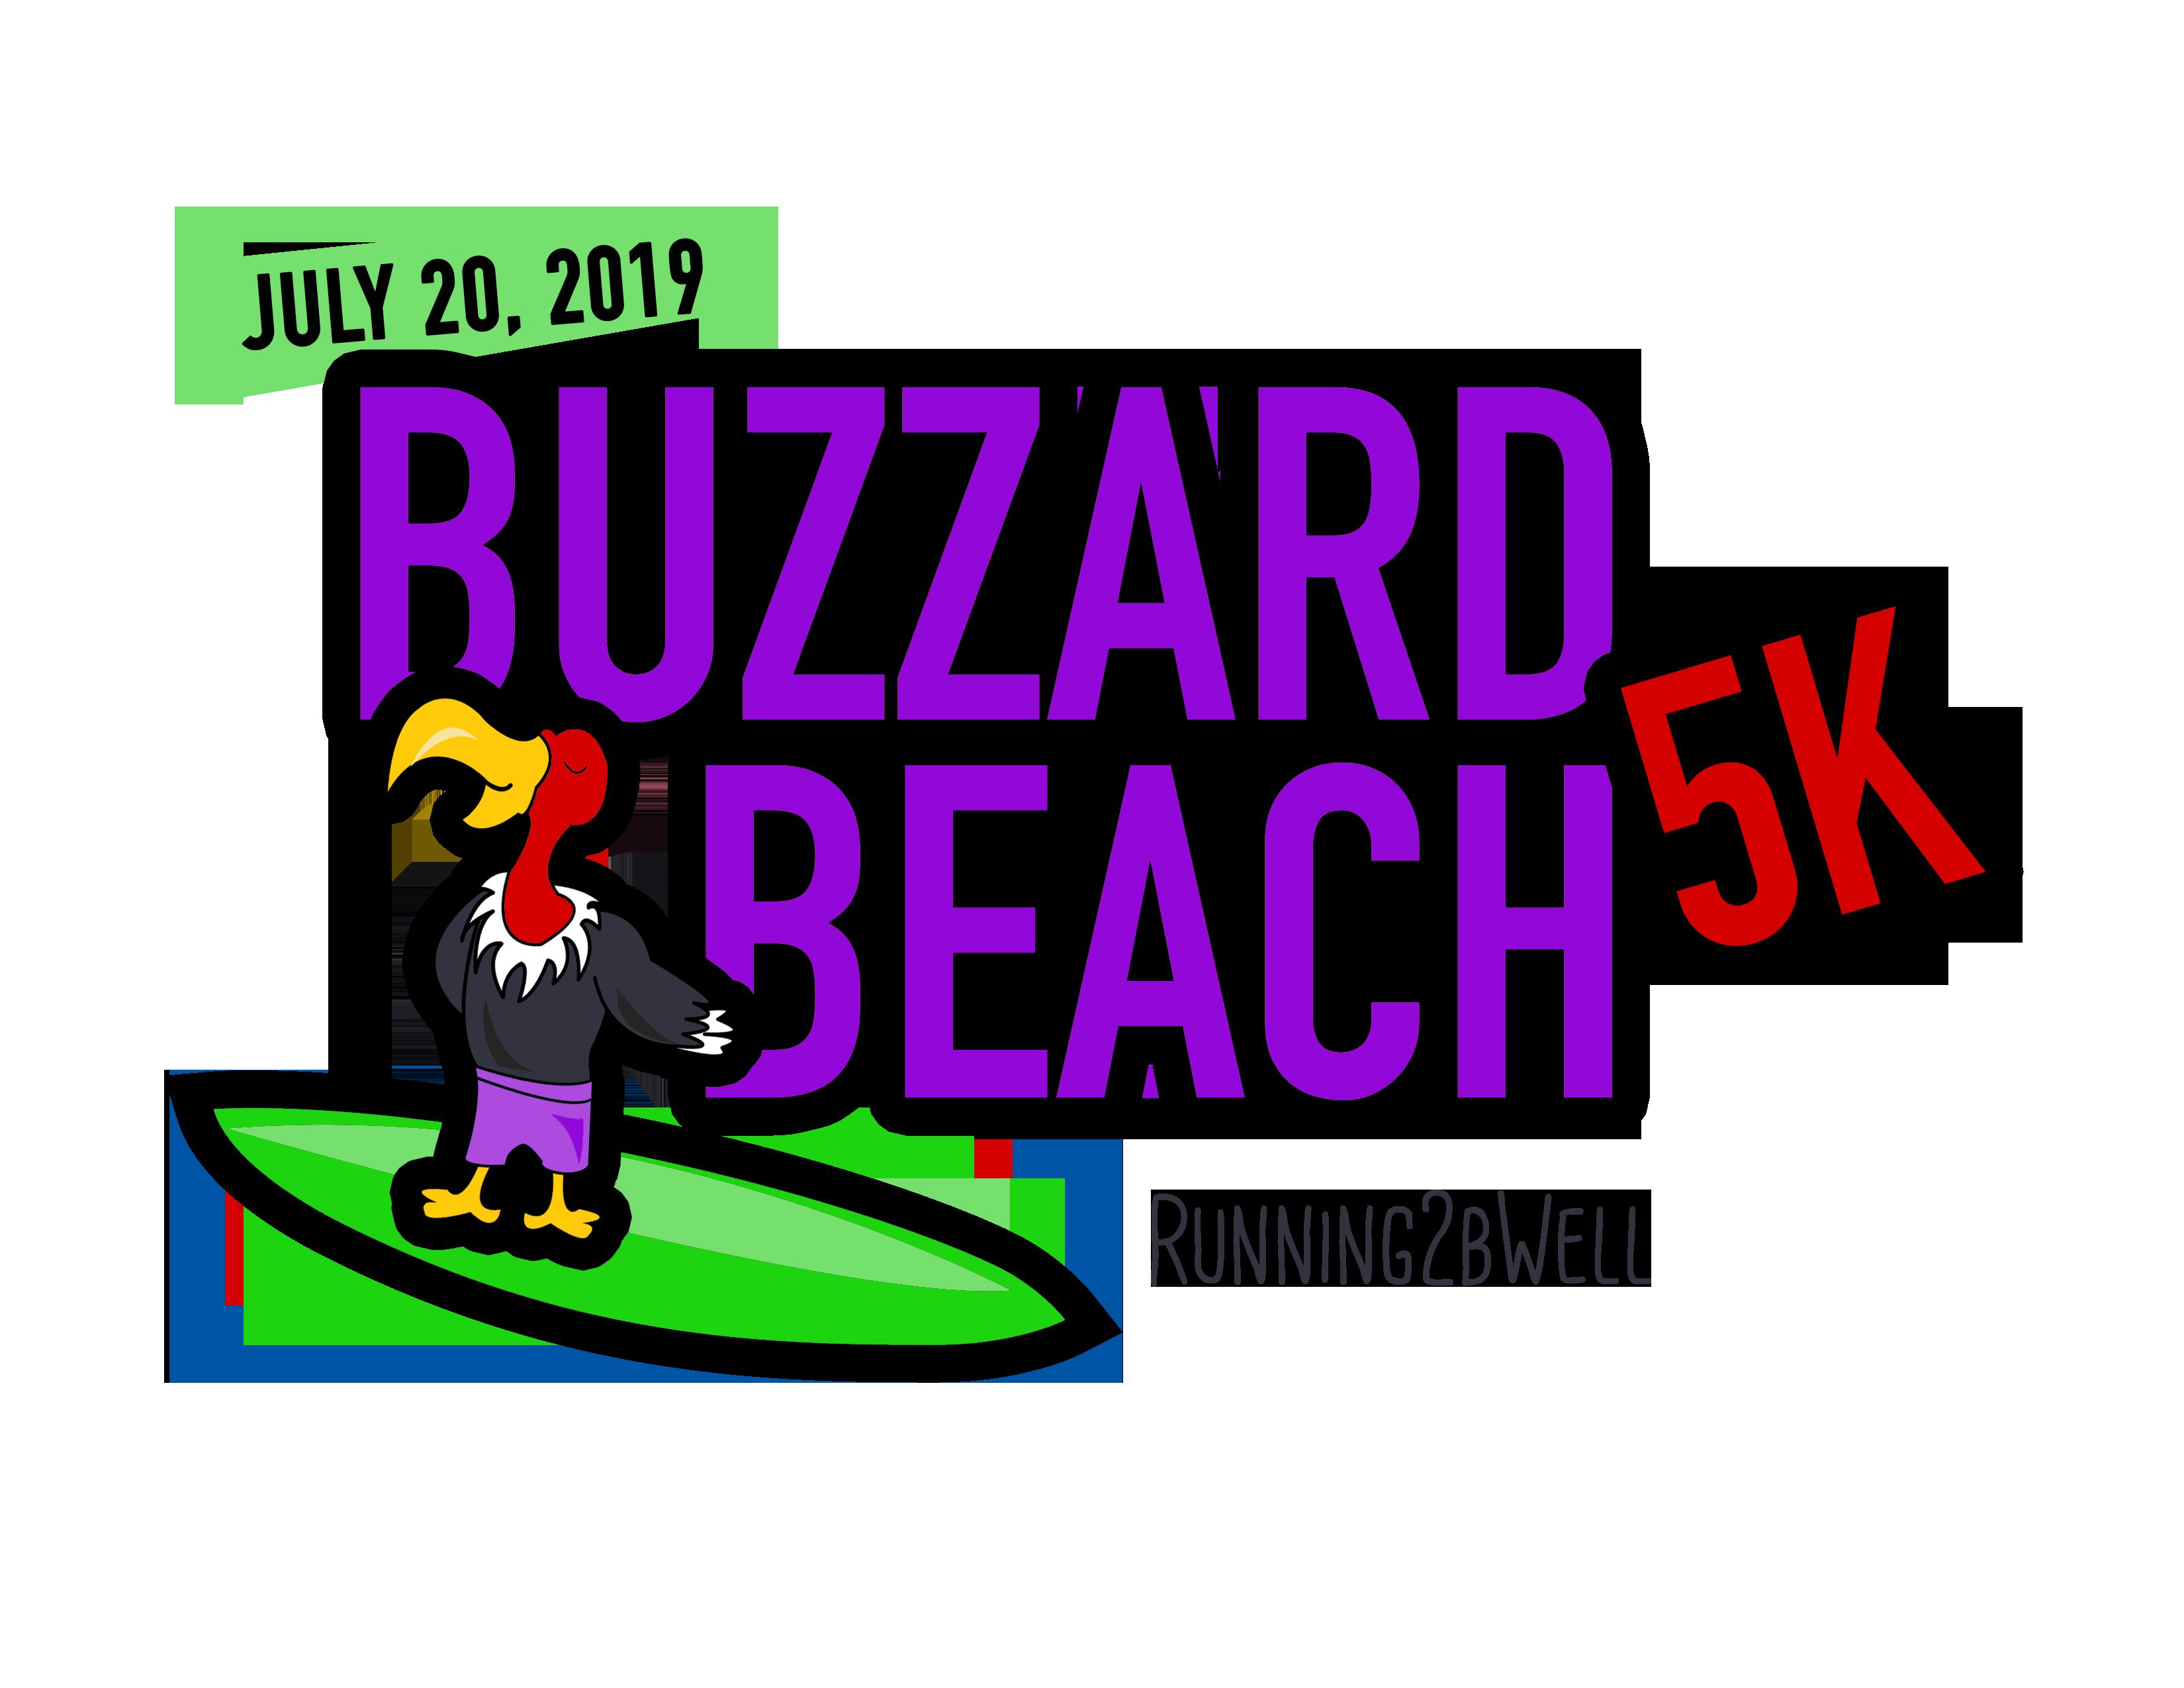 Buzzard Beach 5K